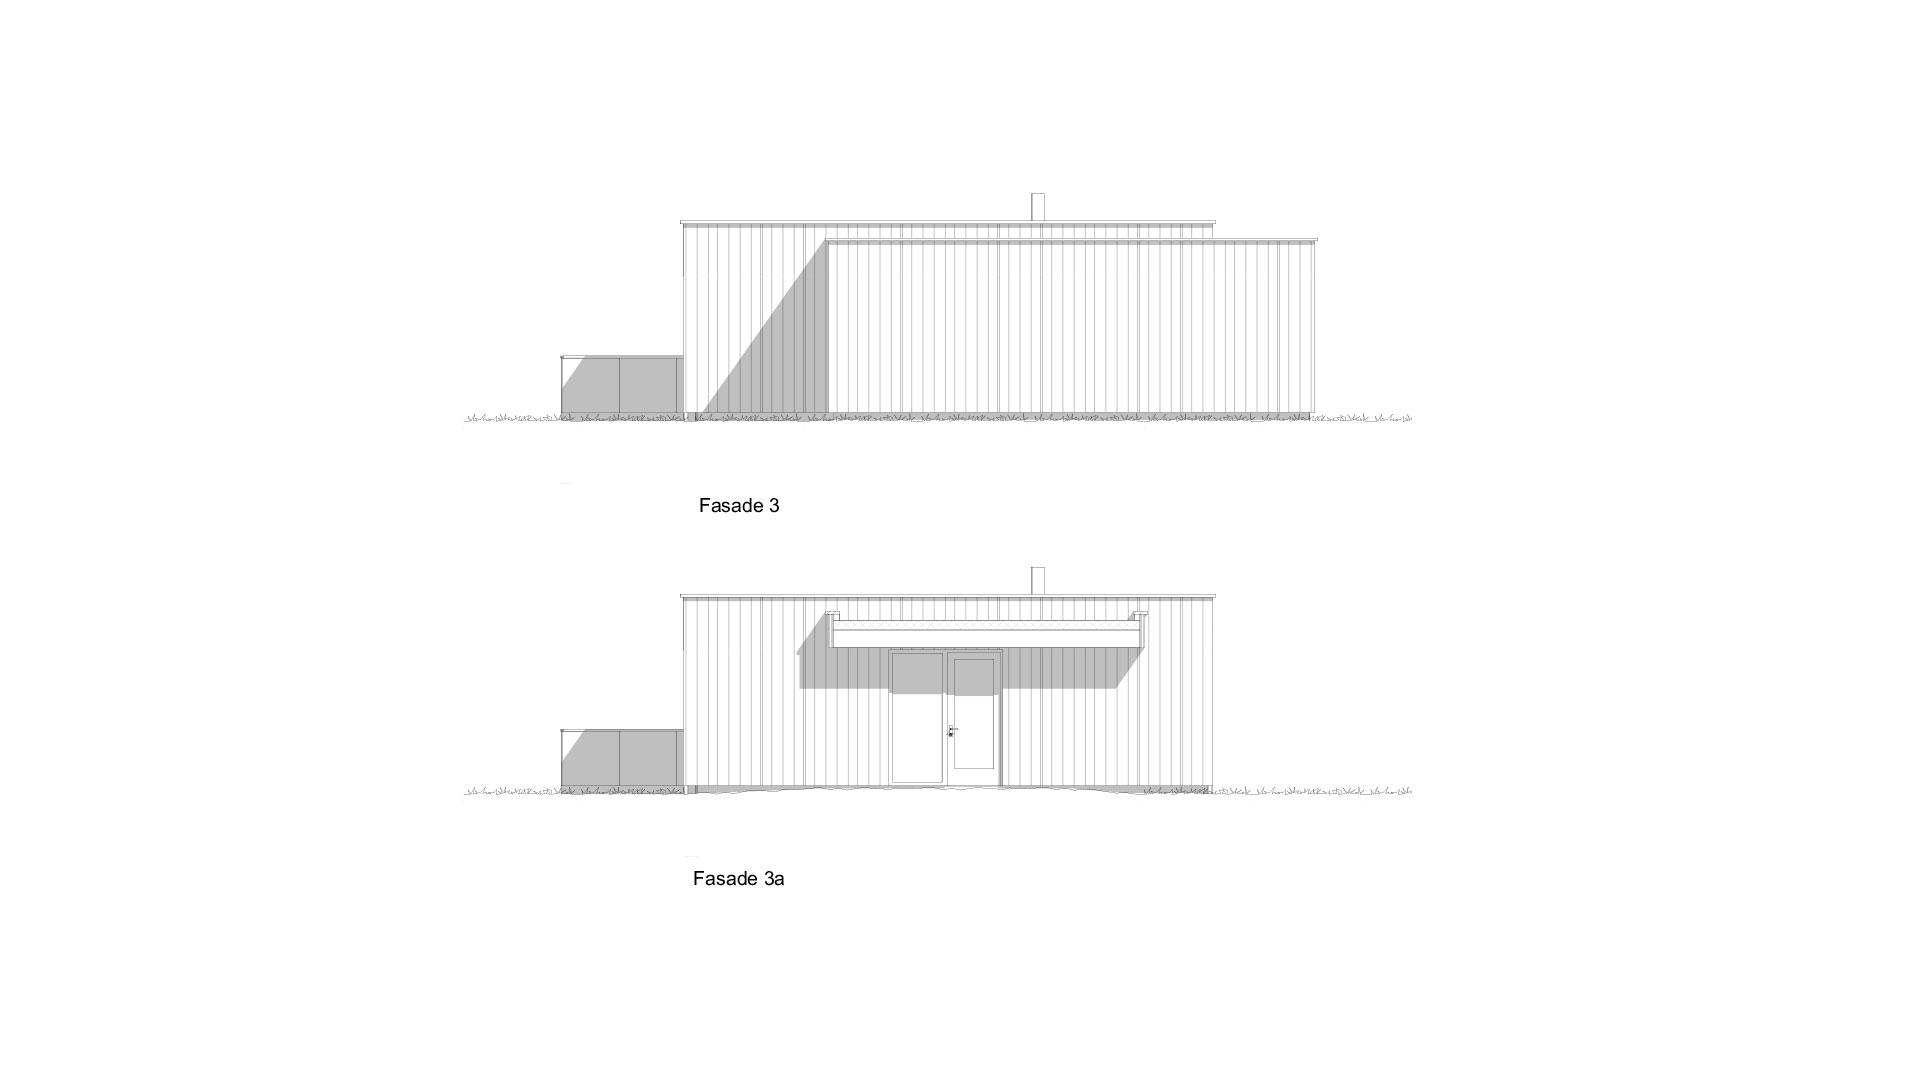 Panorama_Fasade3.jpg